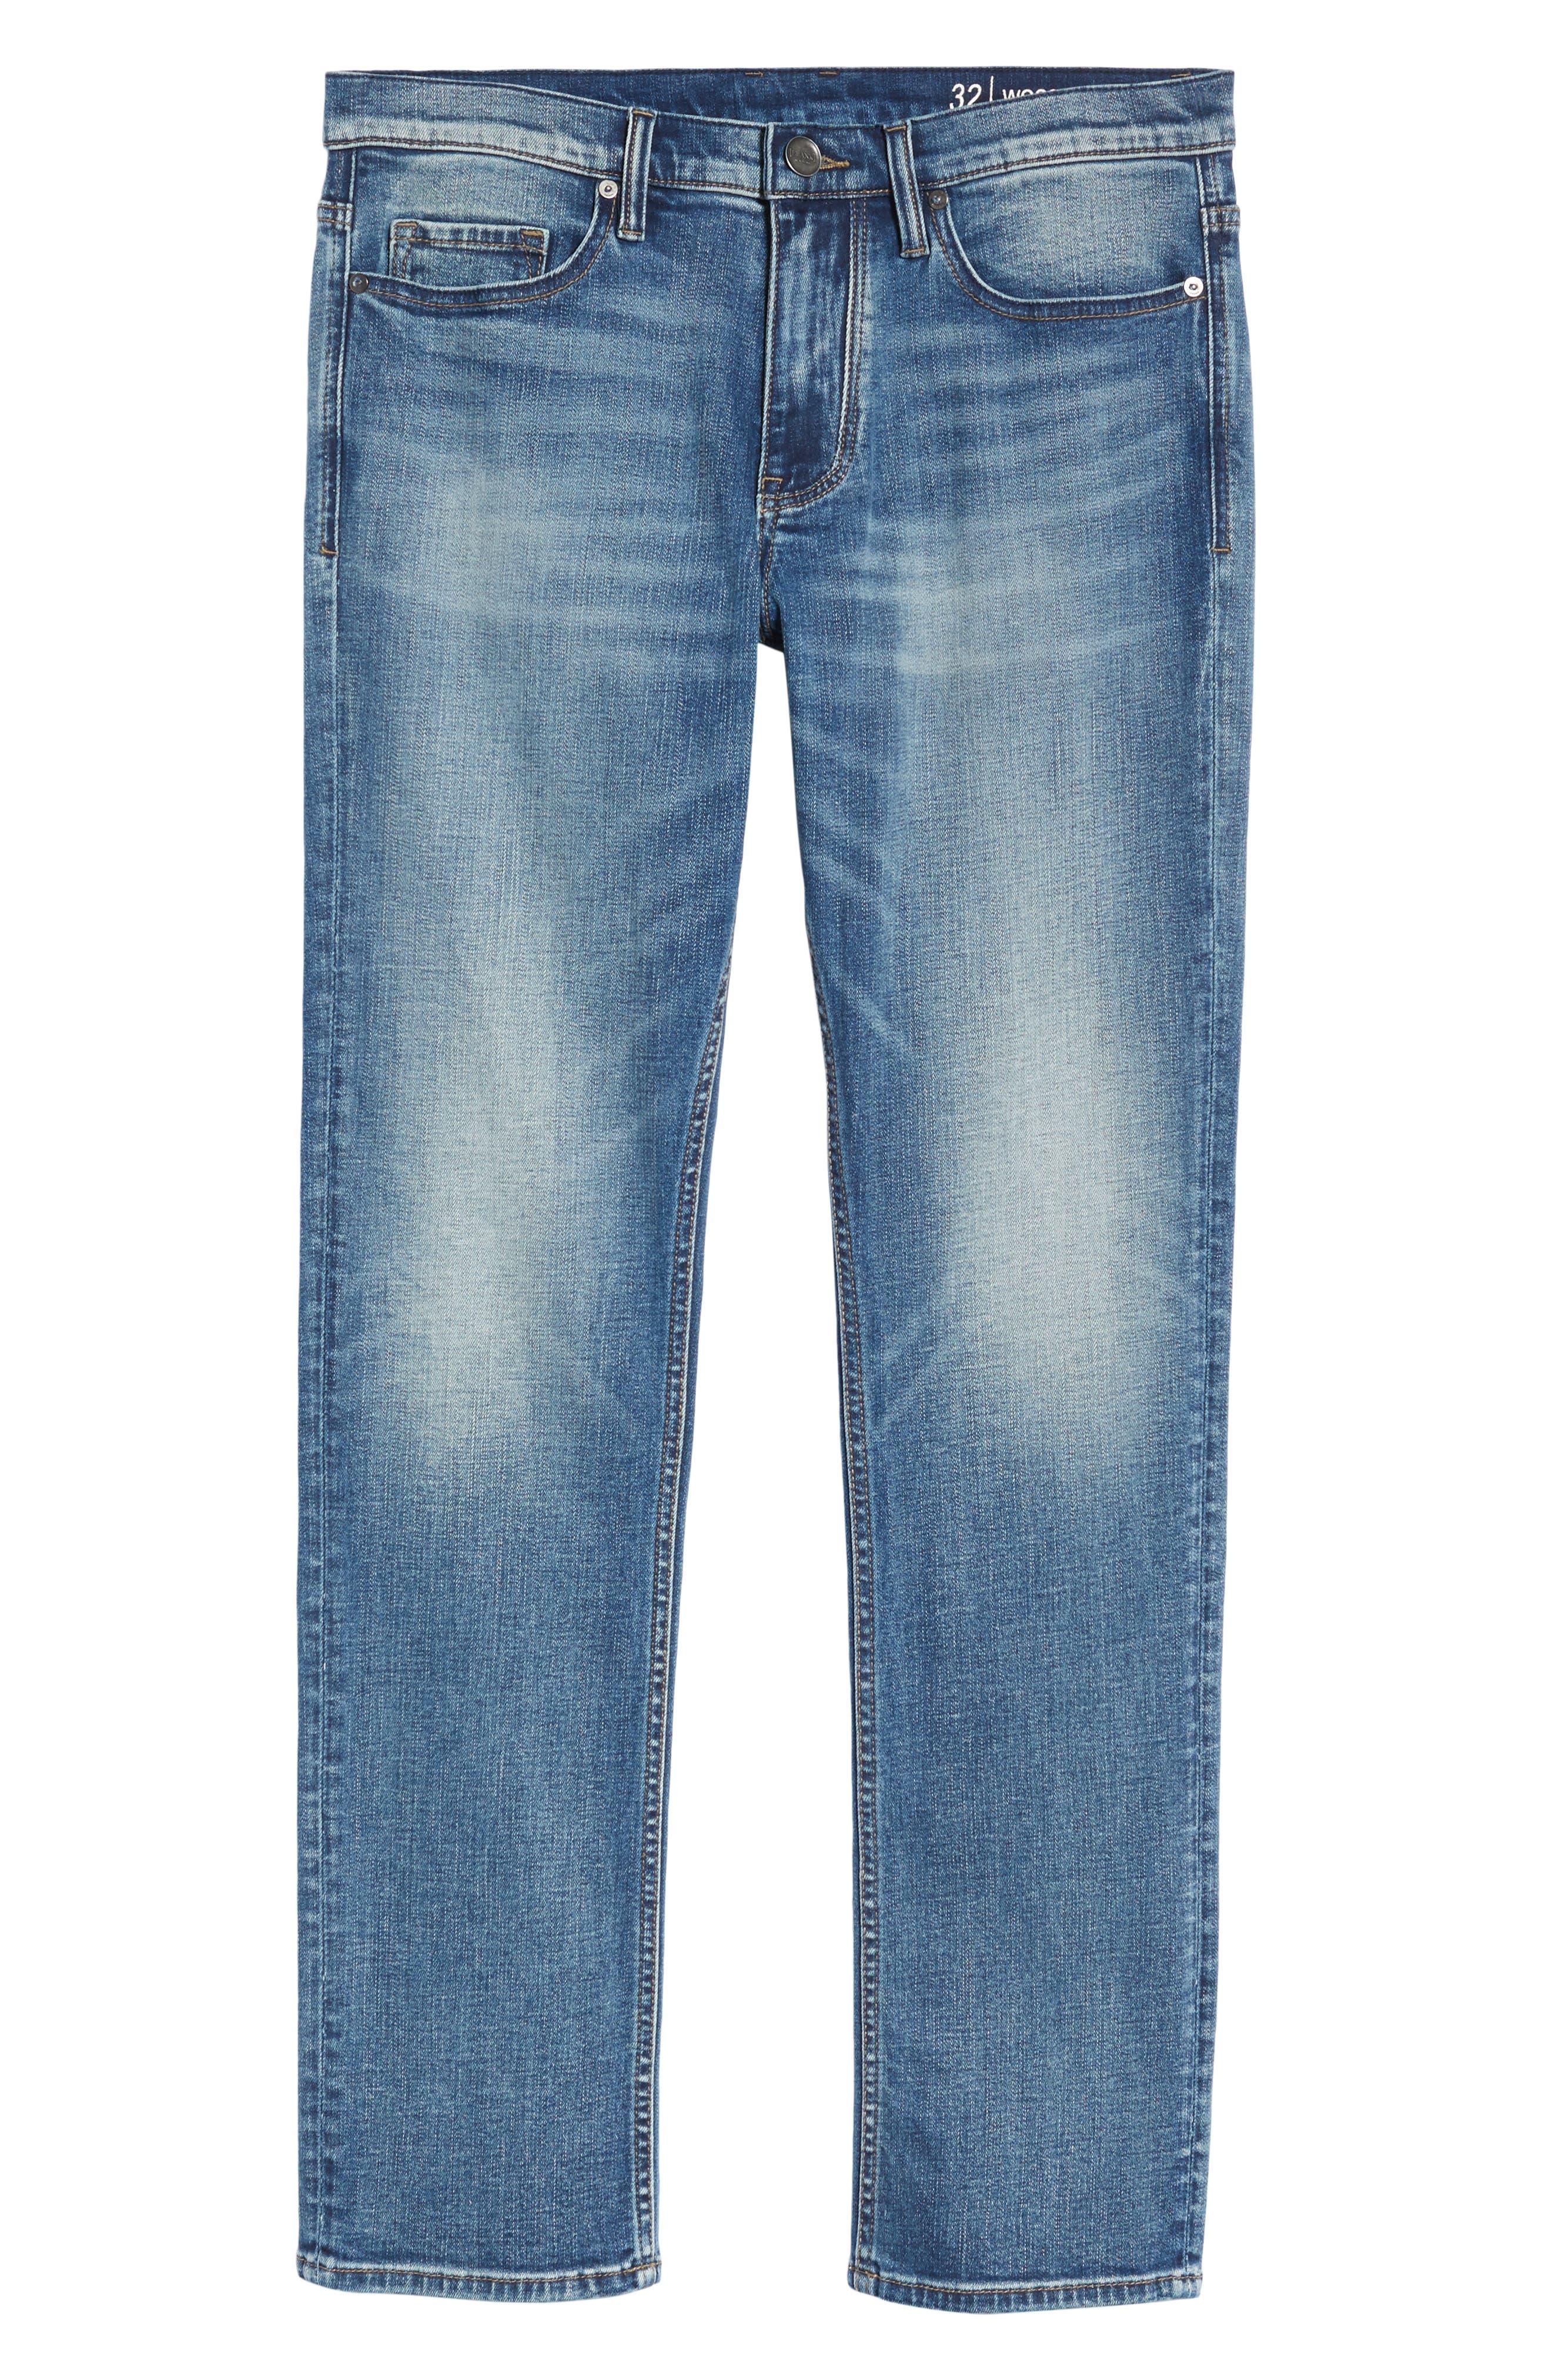 Wooster Slim Fit Jeans,                             Alternate thumbnail 6, color,                             400